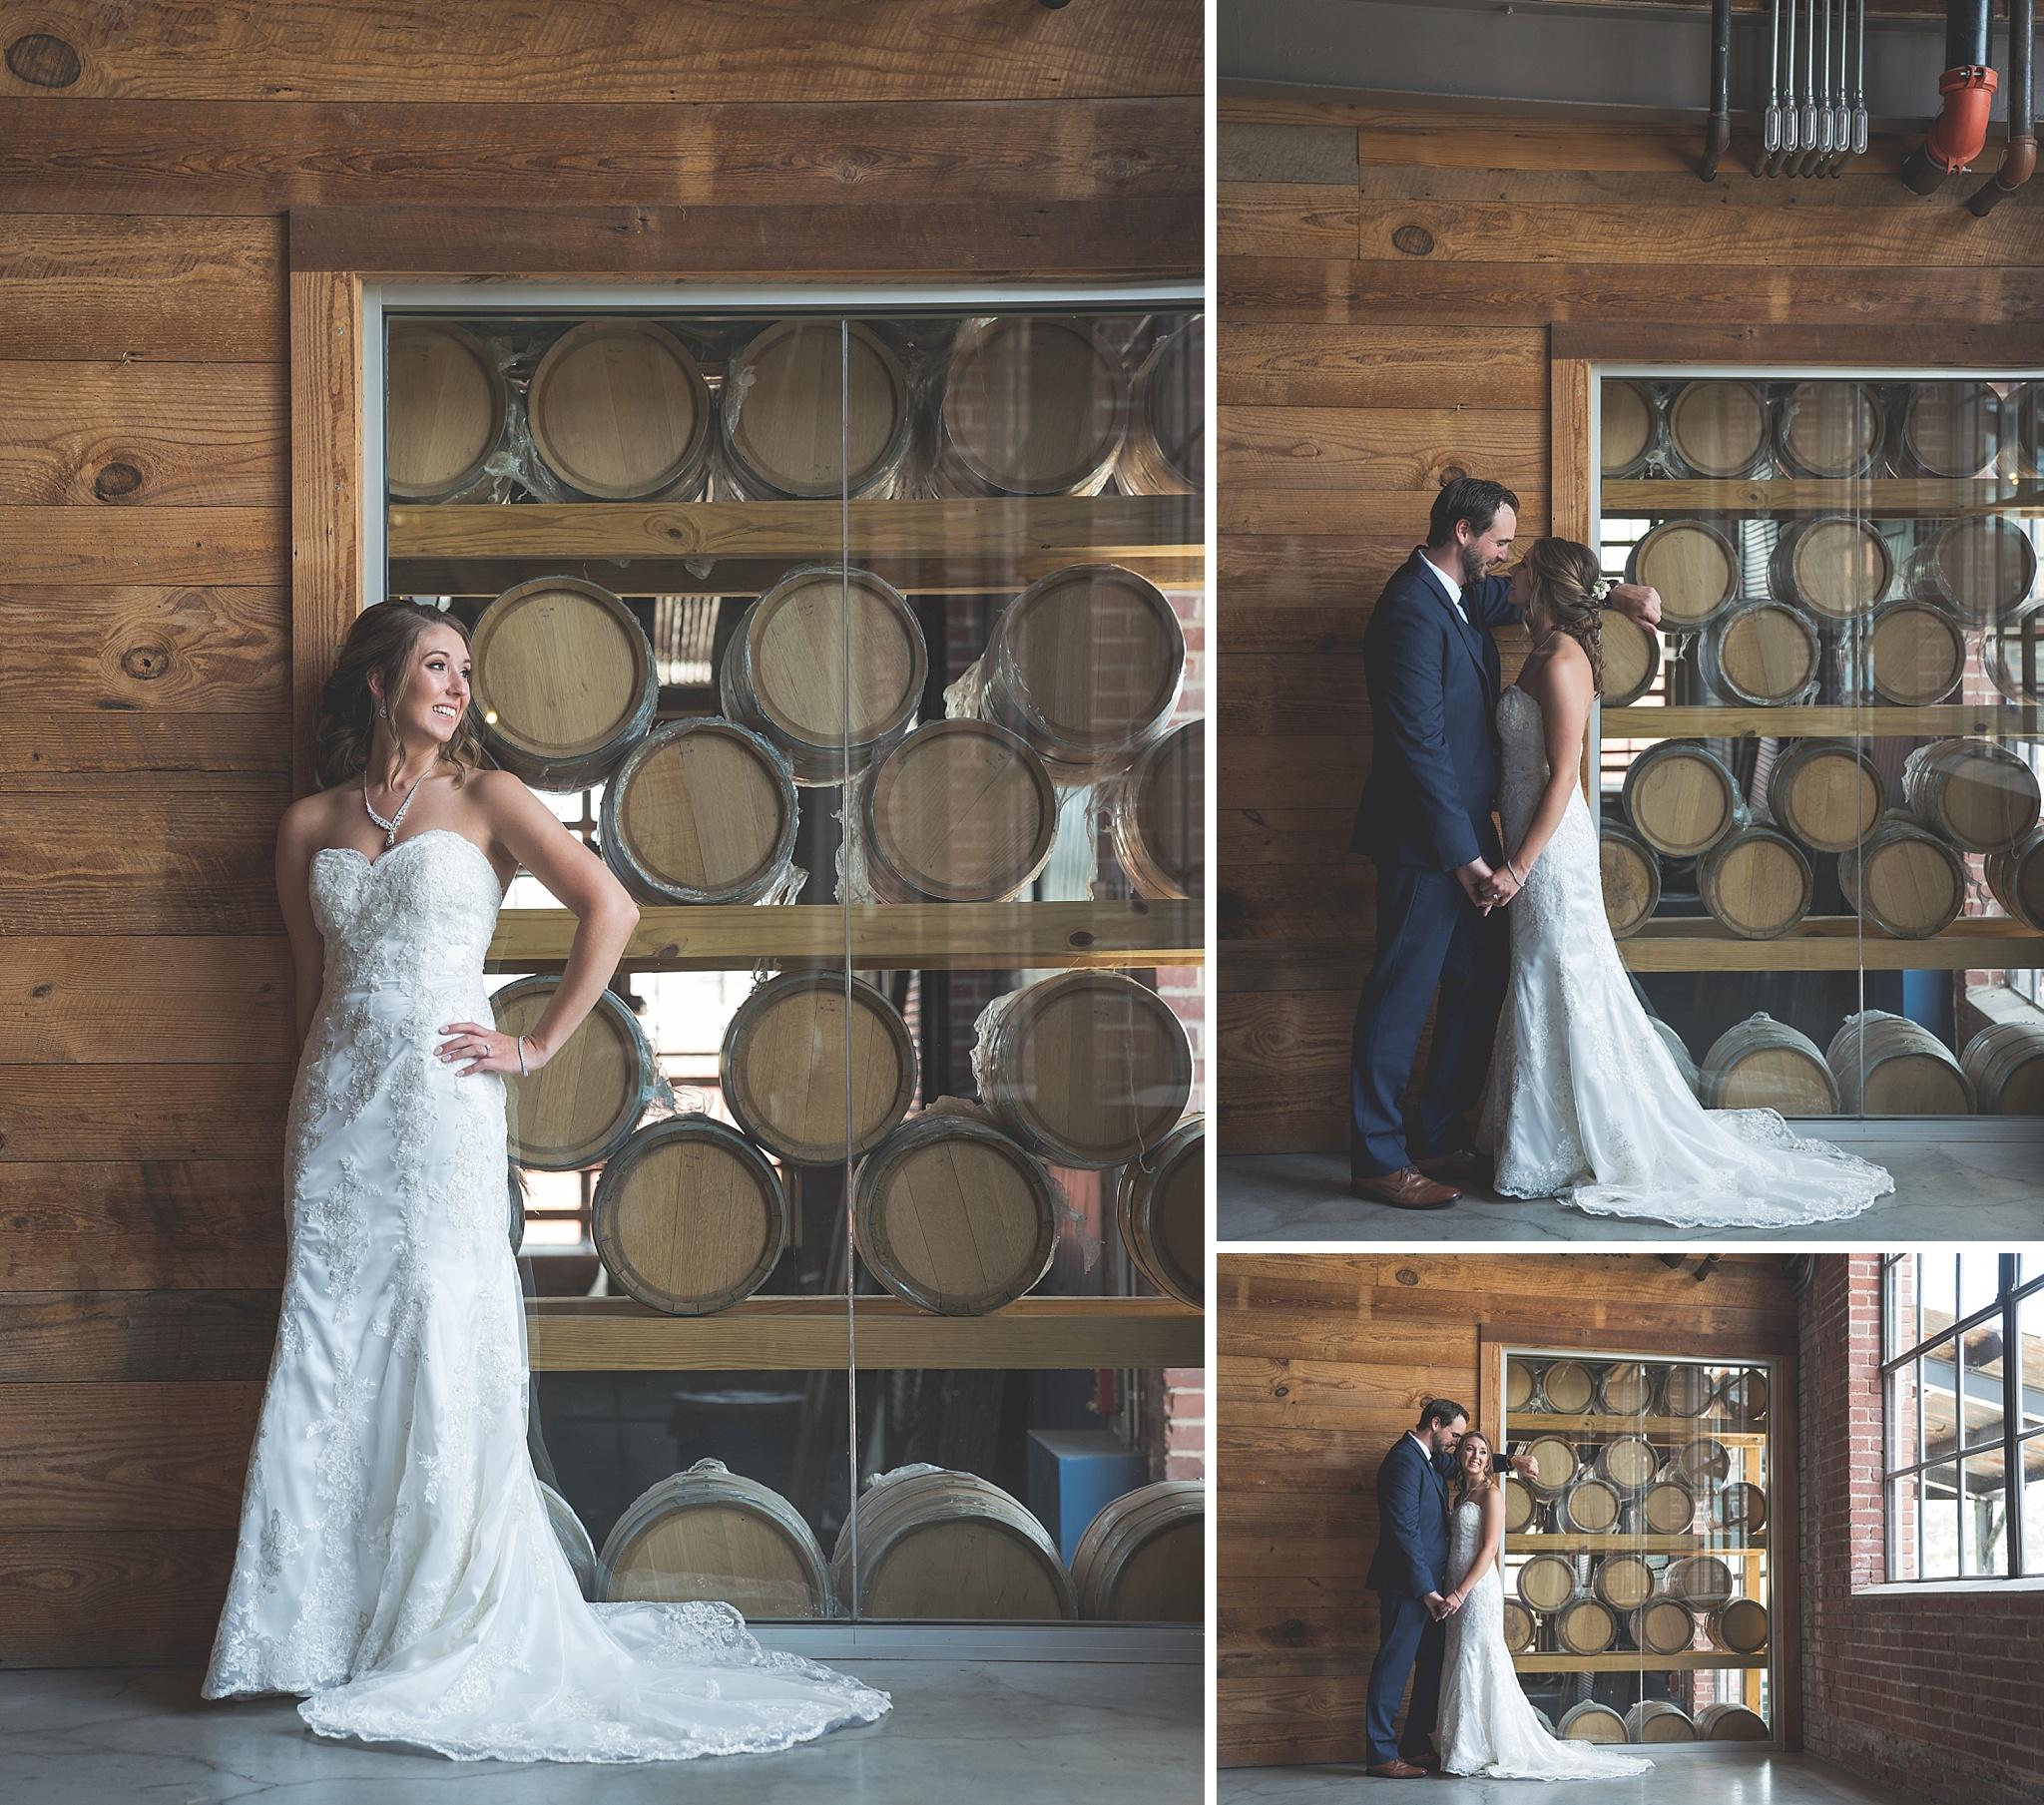 Rickhouse-Durham-NC-Wedding-Photographer-025.jpg